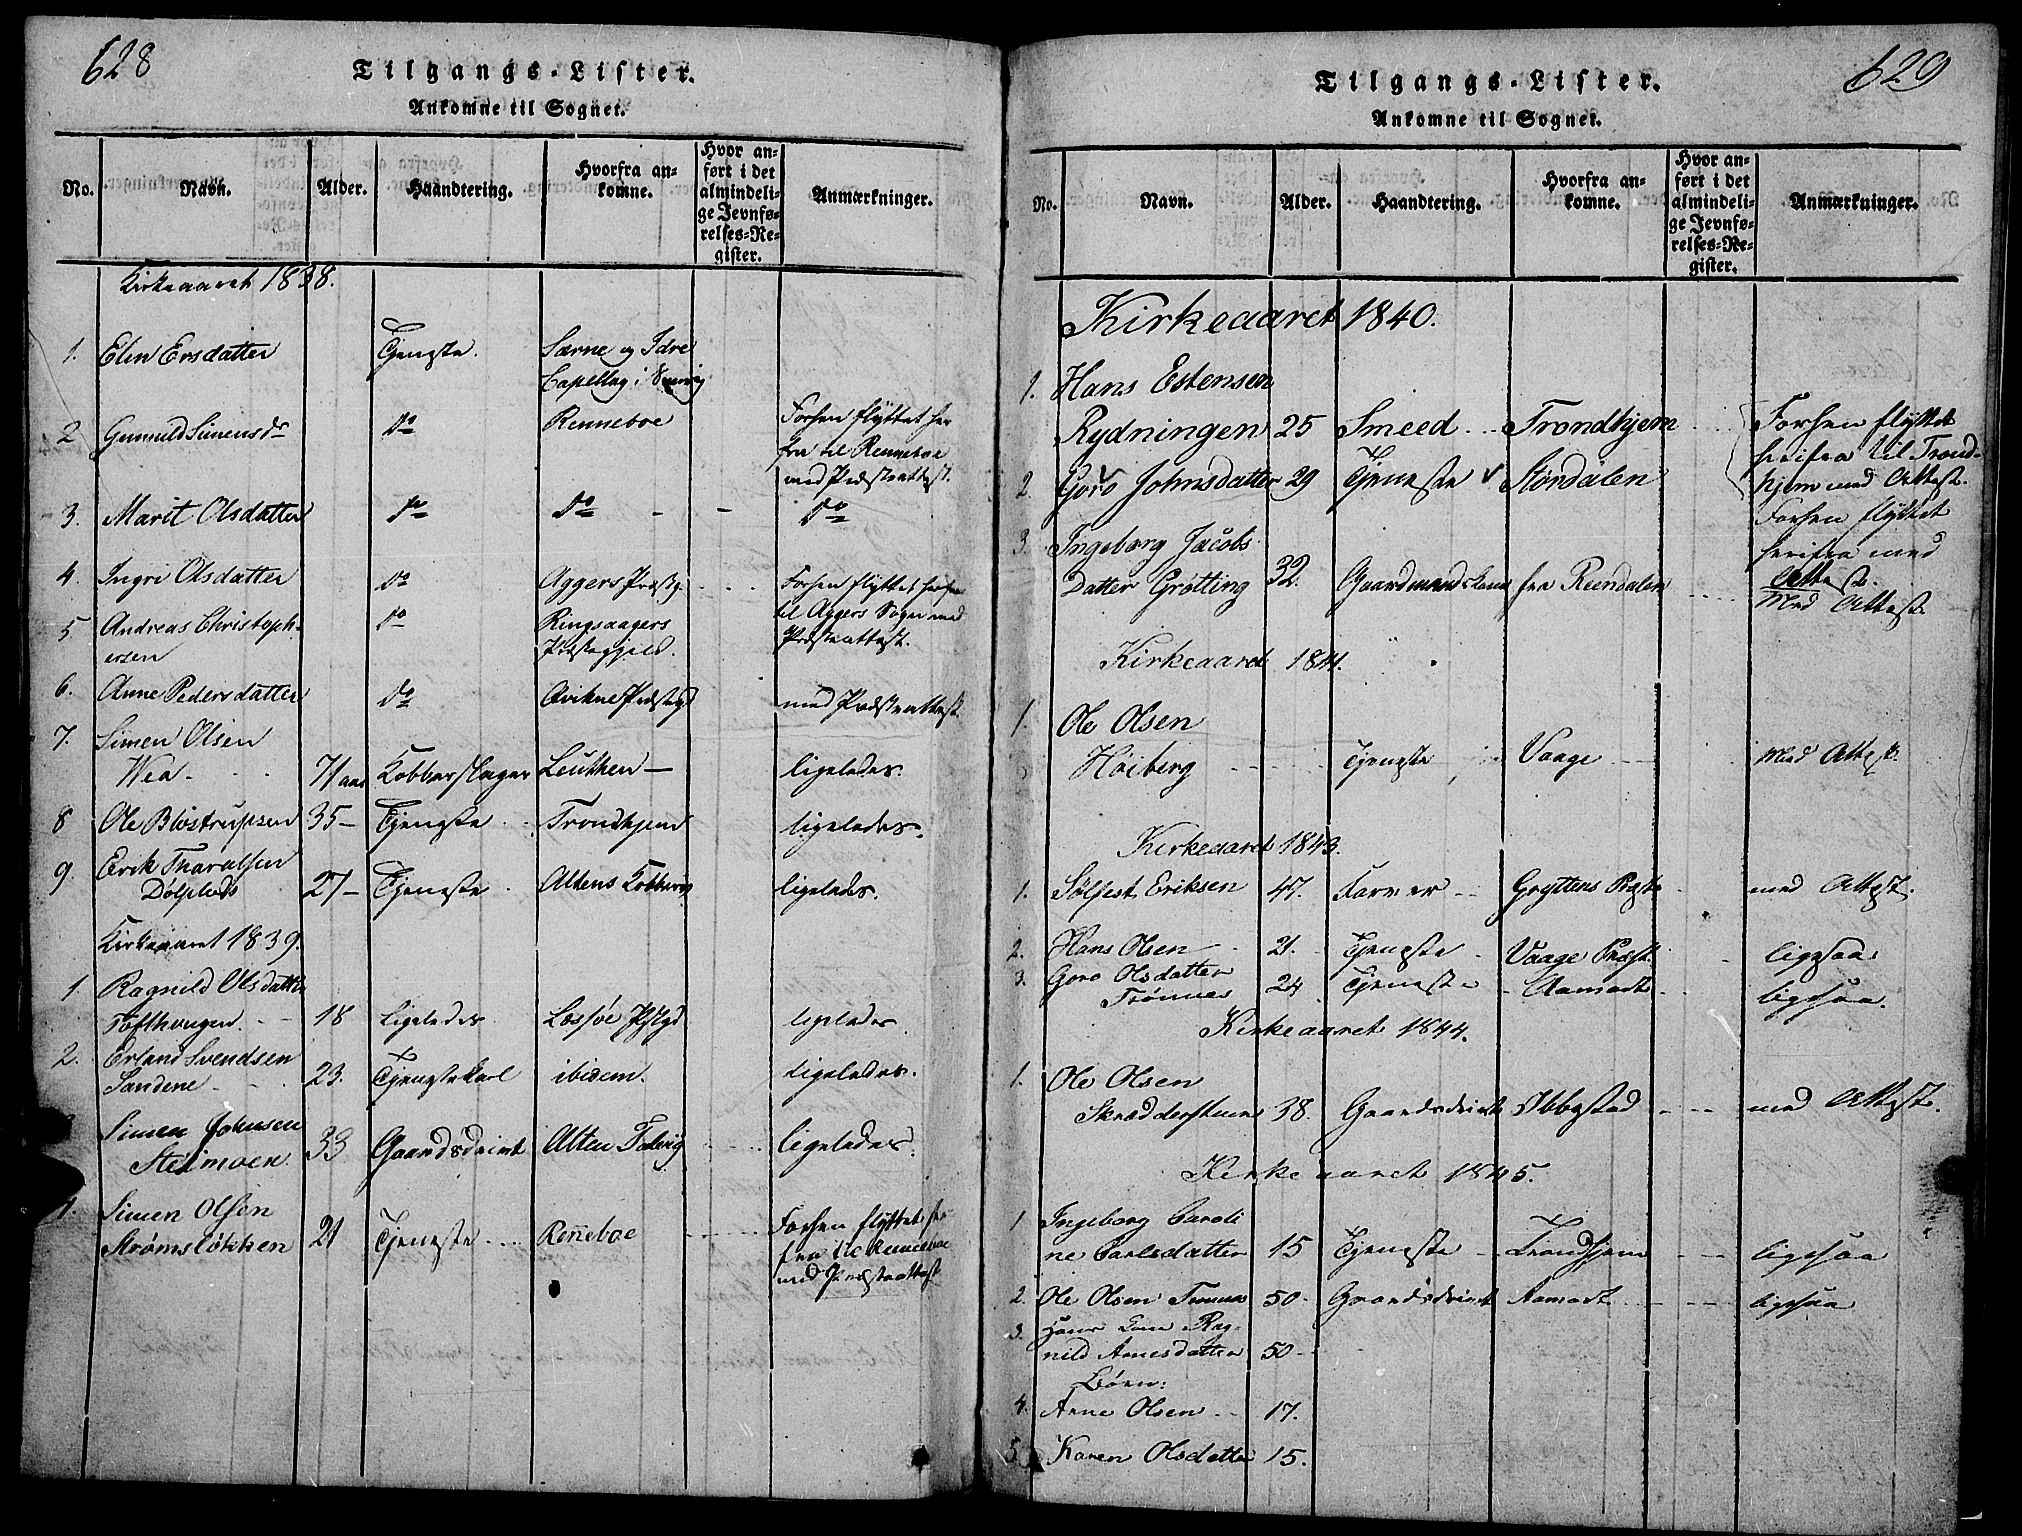 SAH, Tynset prestekontor, Klokkerbok nr. 2, 1814-1862, s. 628-629